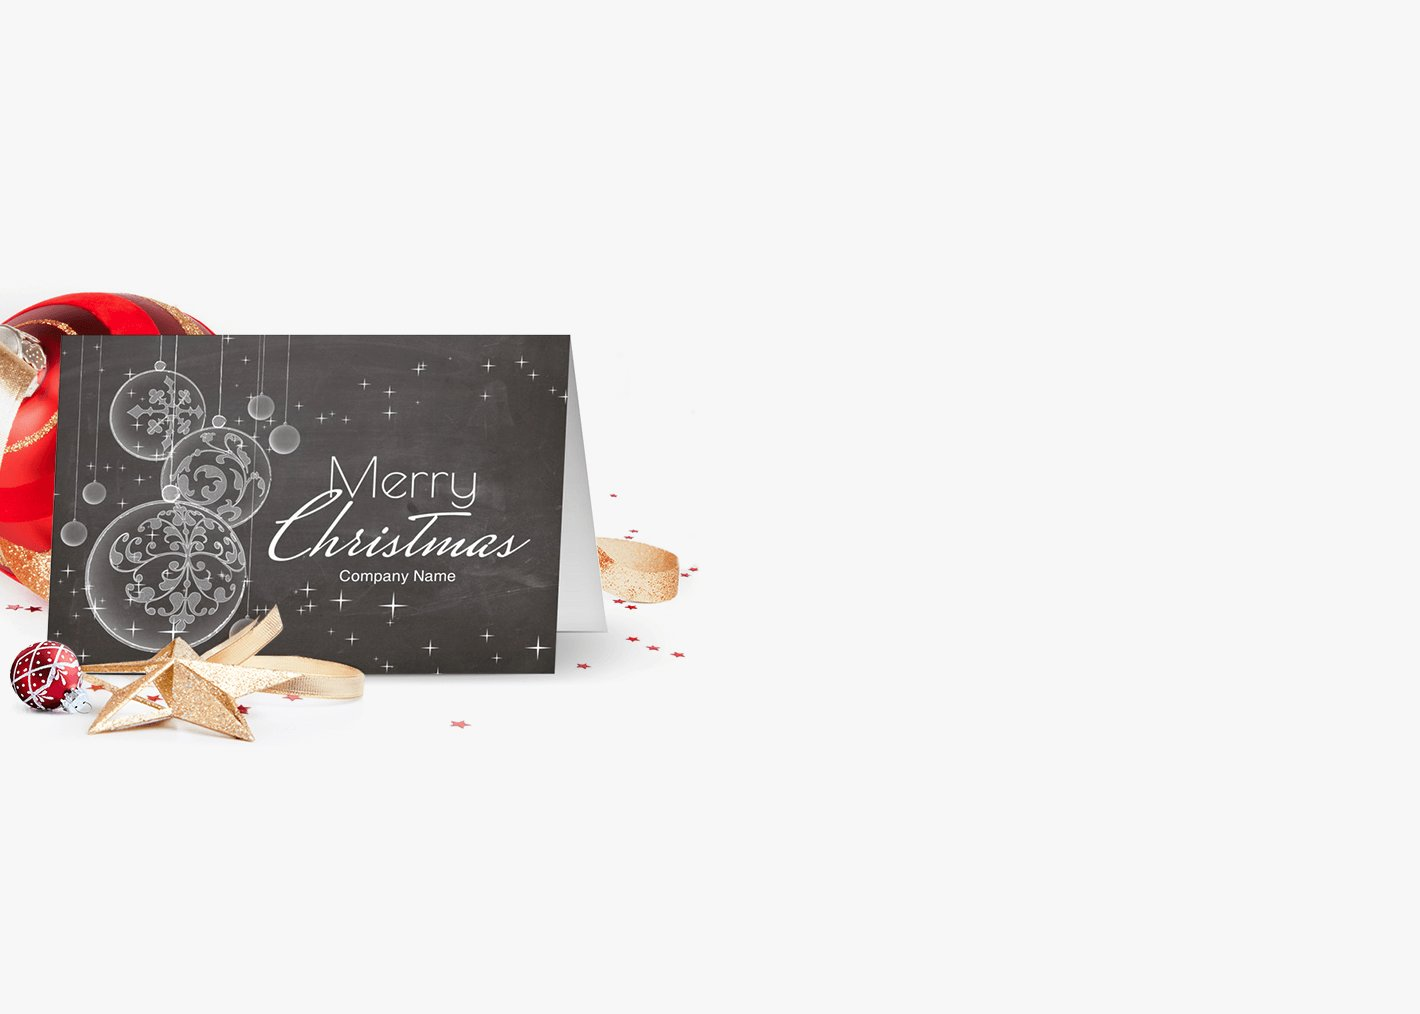 Christmas Cards 2018 | Now -50% OFF | Optimalprint